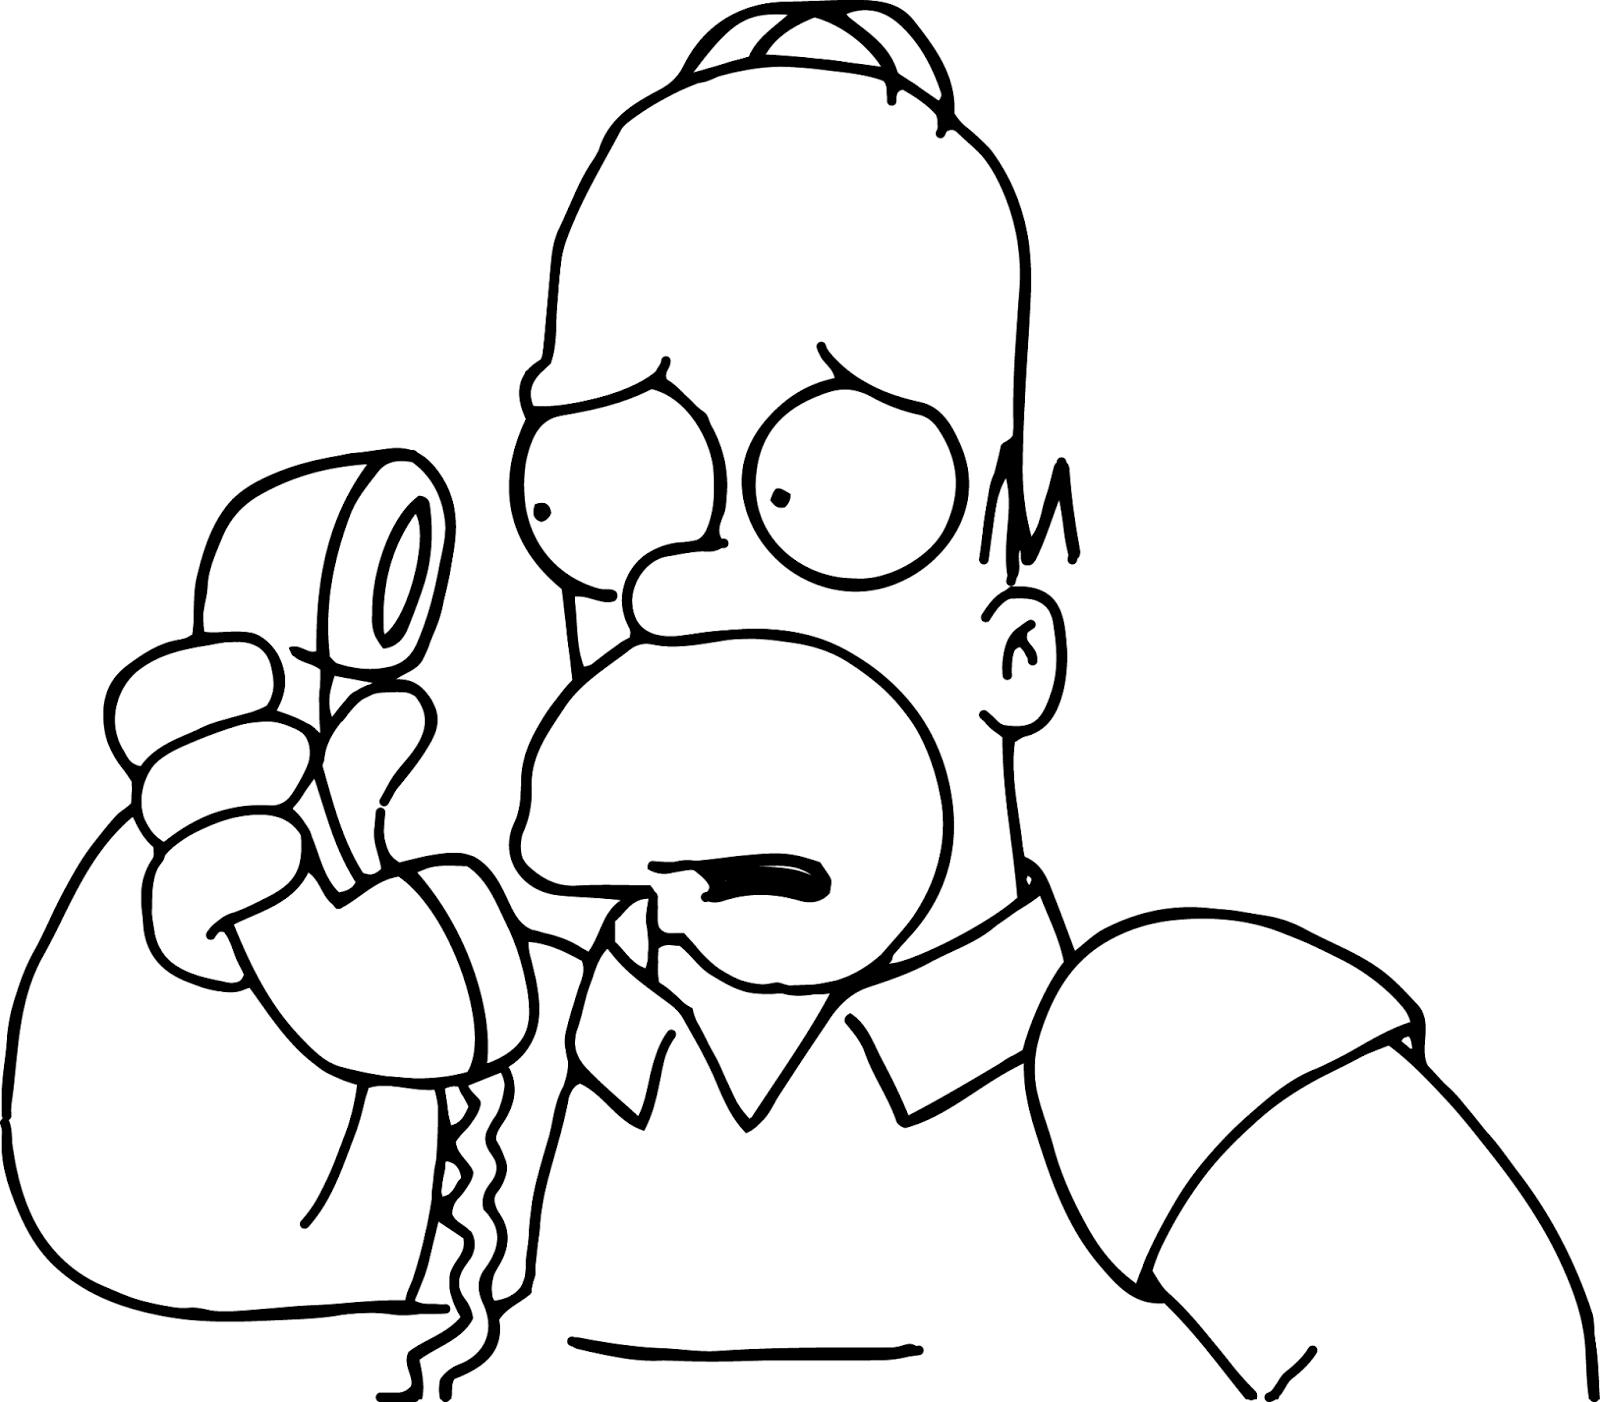 P 225 Ginas Para Colorear Originales Original Coloring Pages The Simpsons On Halloween